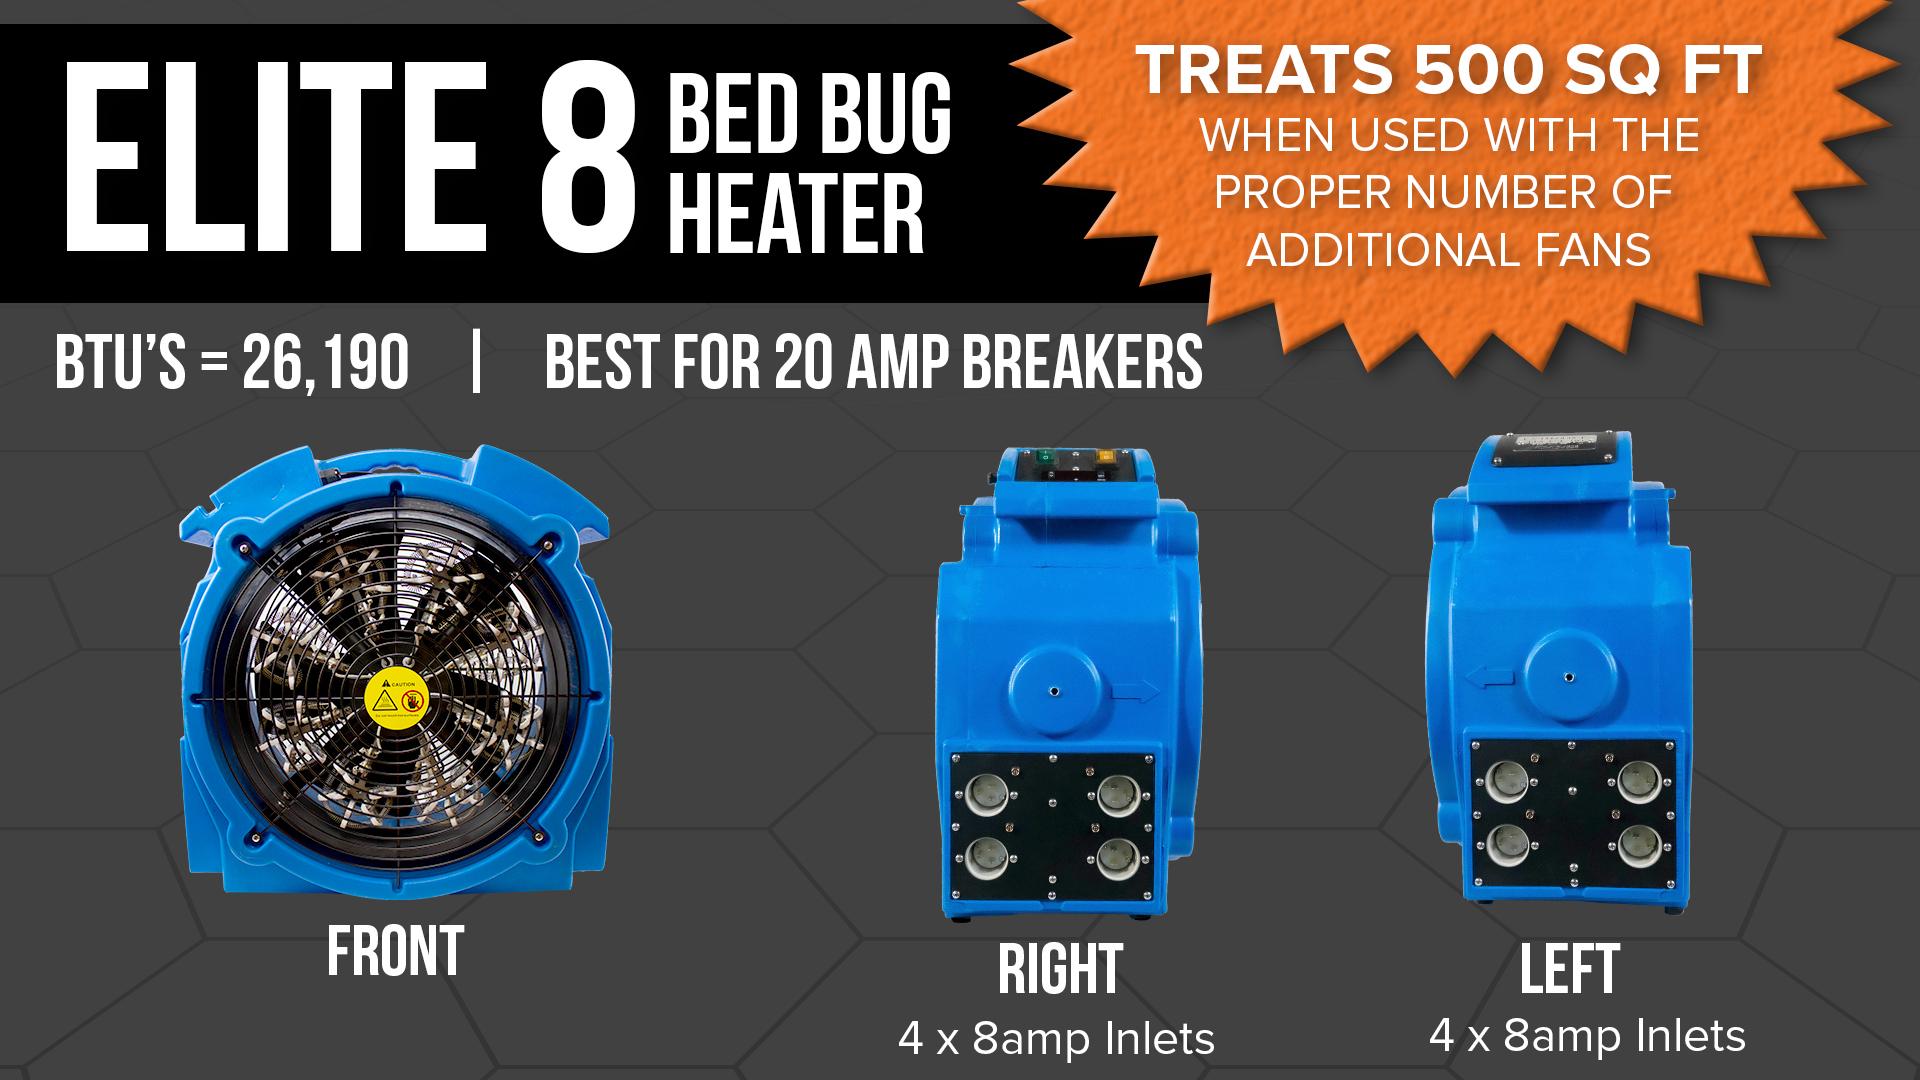 Elite 8 Bedbug Heater Specs